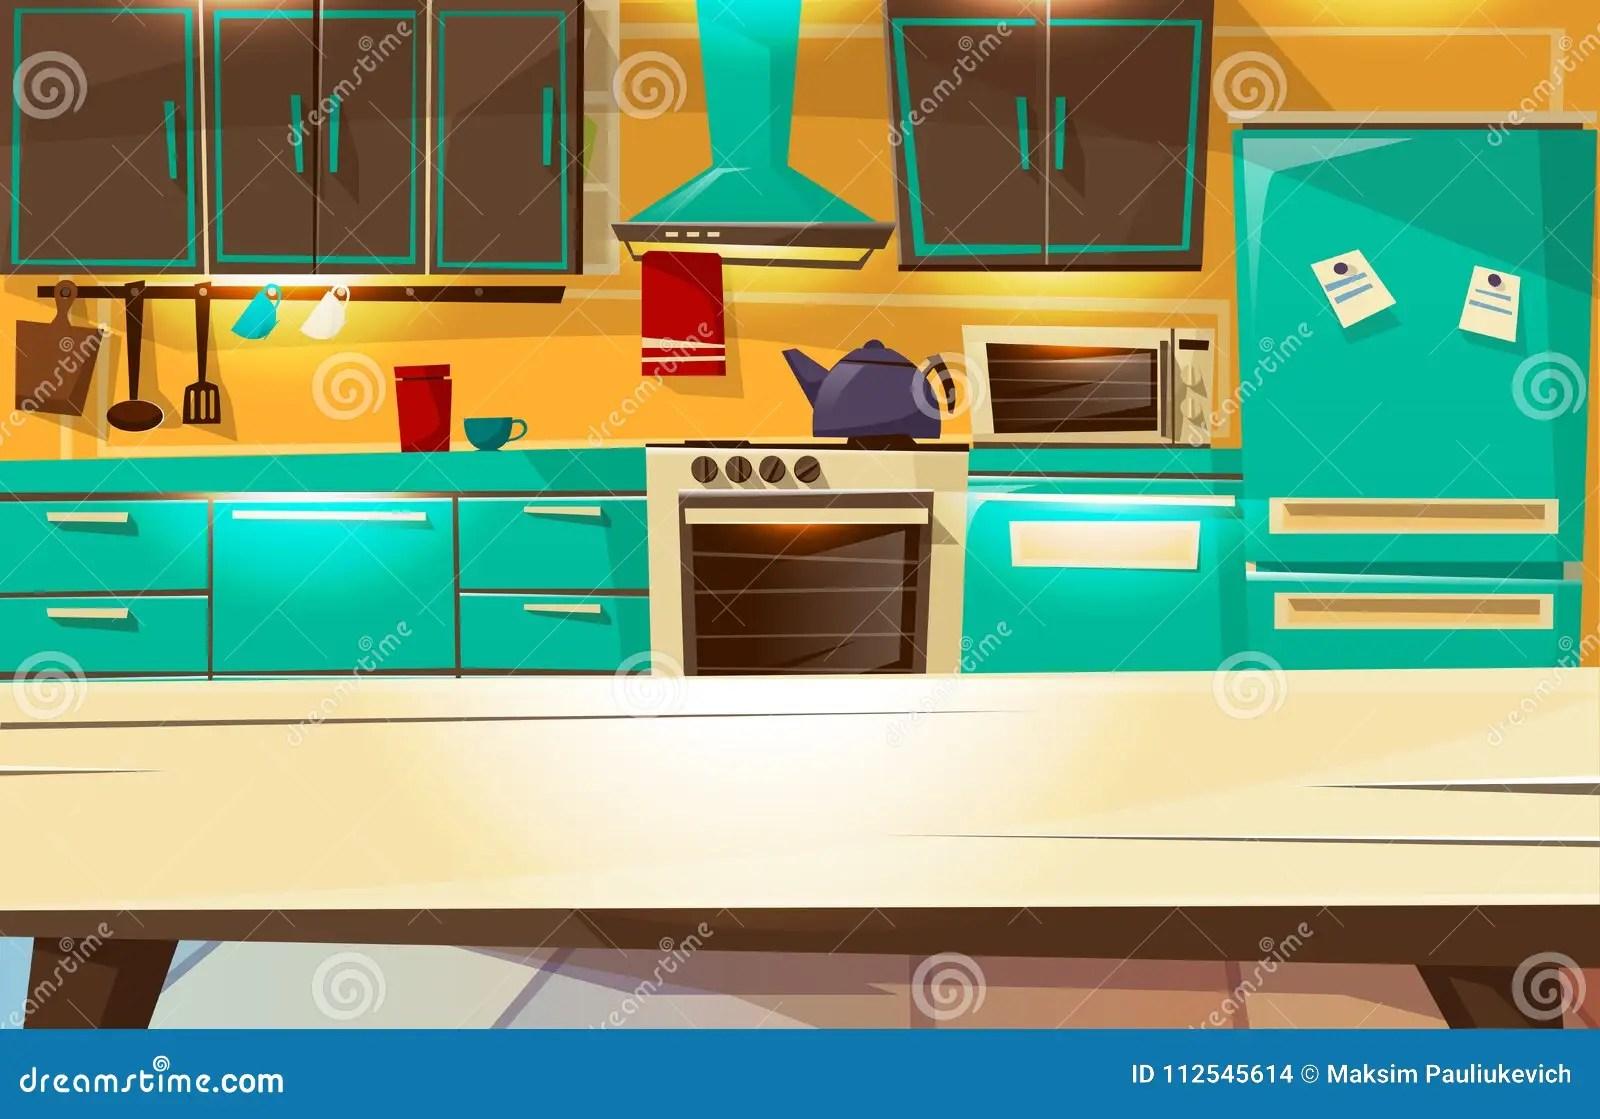 kitchen builder app the honest com 现代或减速火箭的厨房家具和装置的厨房内部背景传染媒介动画片例证向量 从餐桌视图的厨房内部背景传染媒介例证动画片平的设计或现代或减速火箭的厨房家具和装置冰箱或者碗柜架子和厨灶